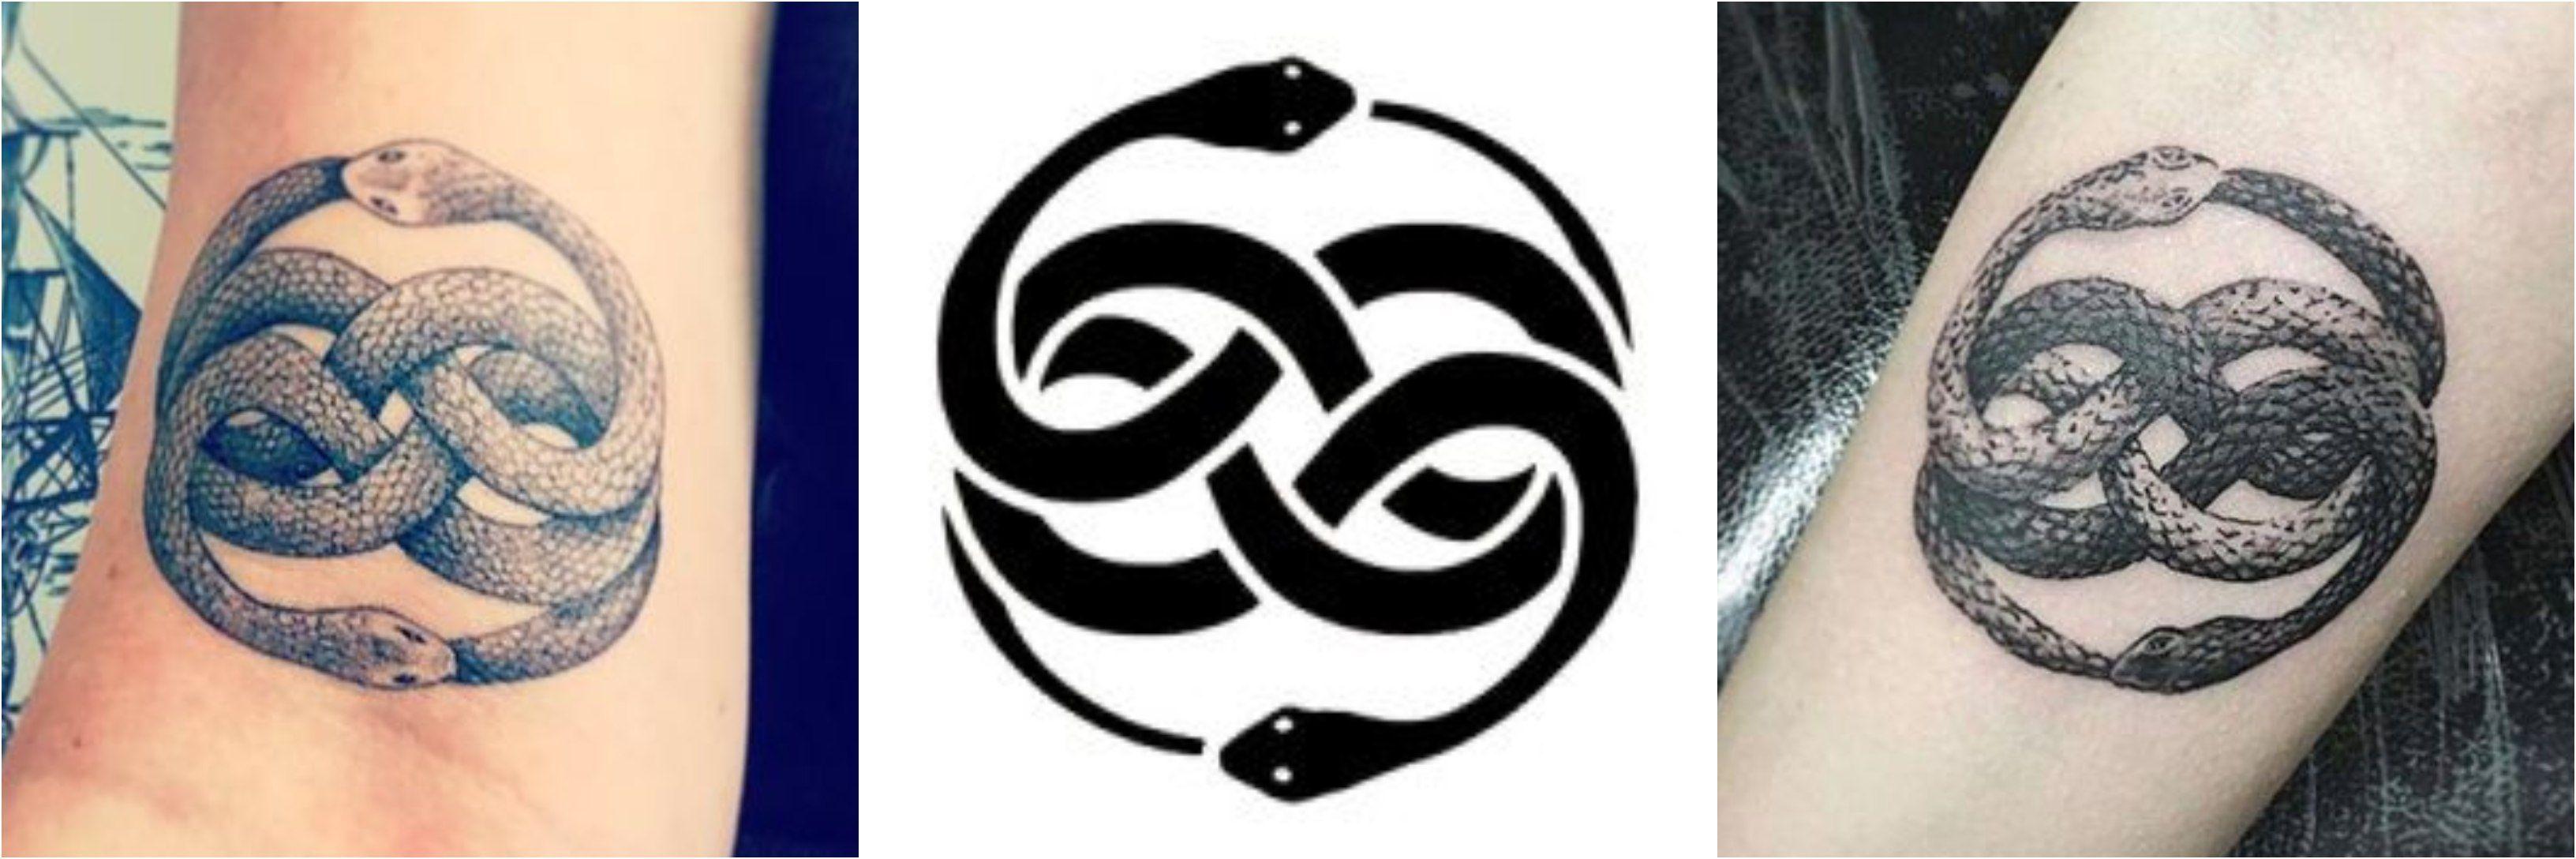 Tattoos Of Ancient Celtic Symbols To Protect Yourself Design Celtic Tattoos Celtic Symbols Celtic Tattoo Symbols